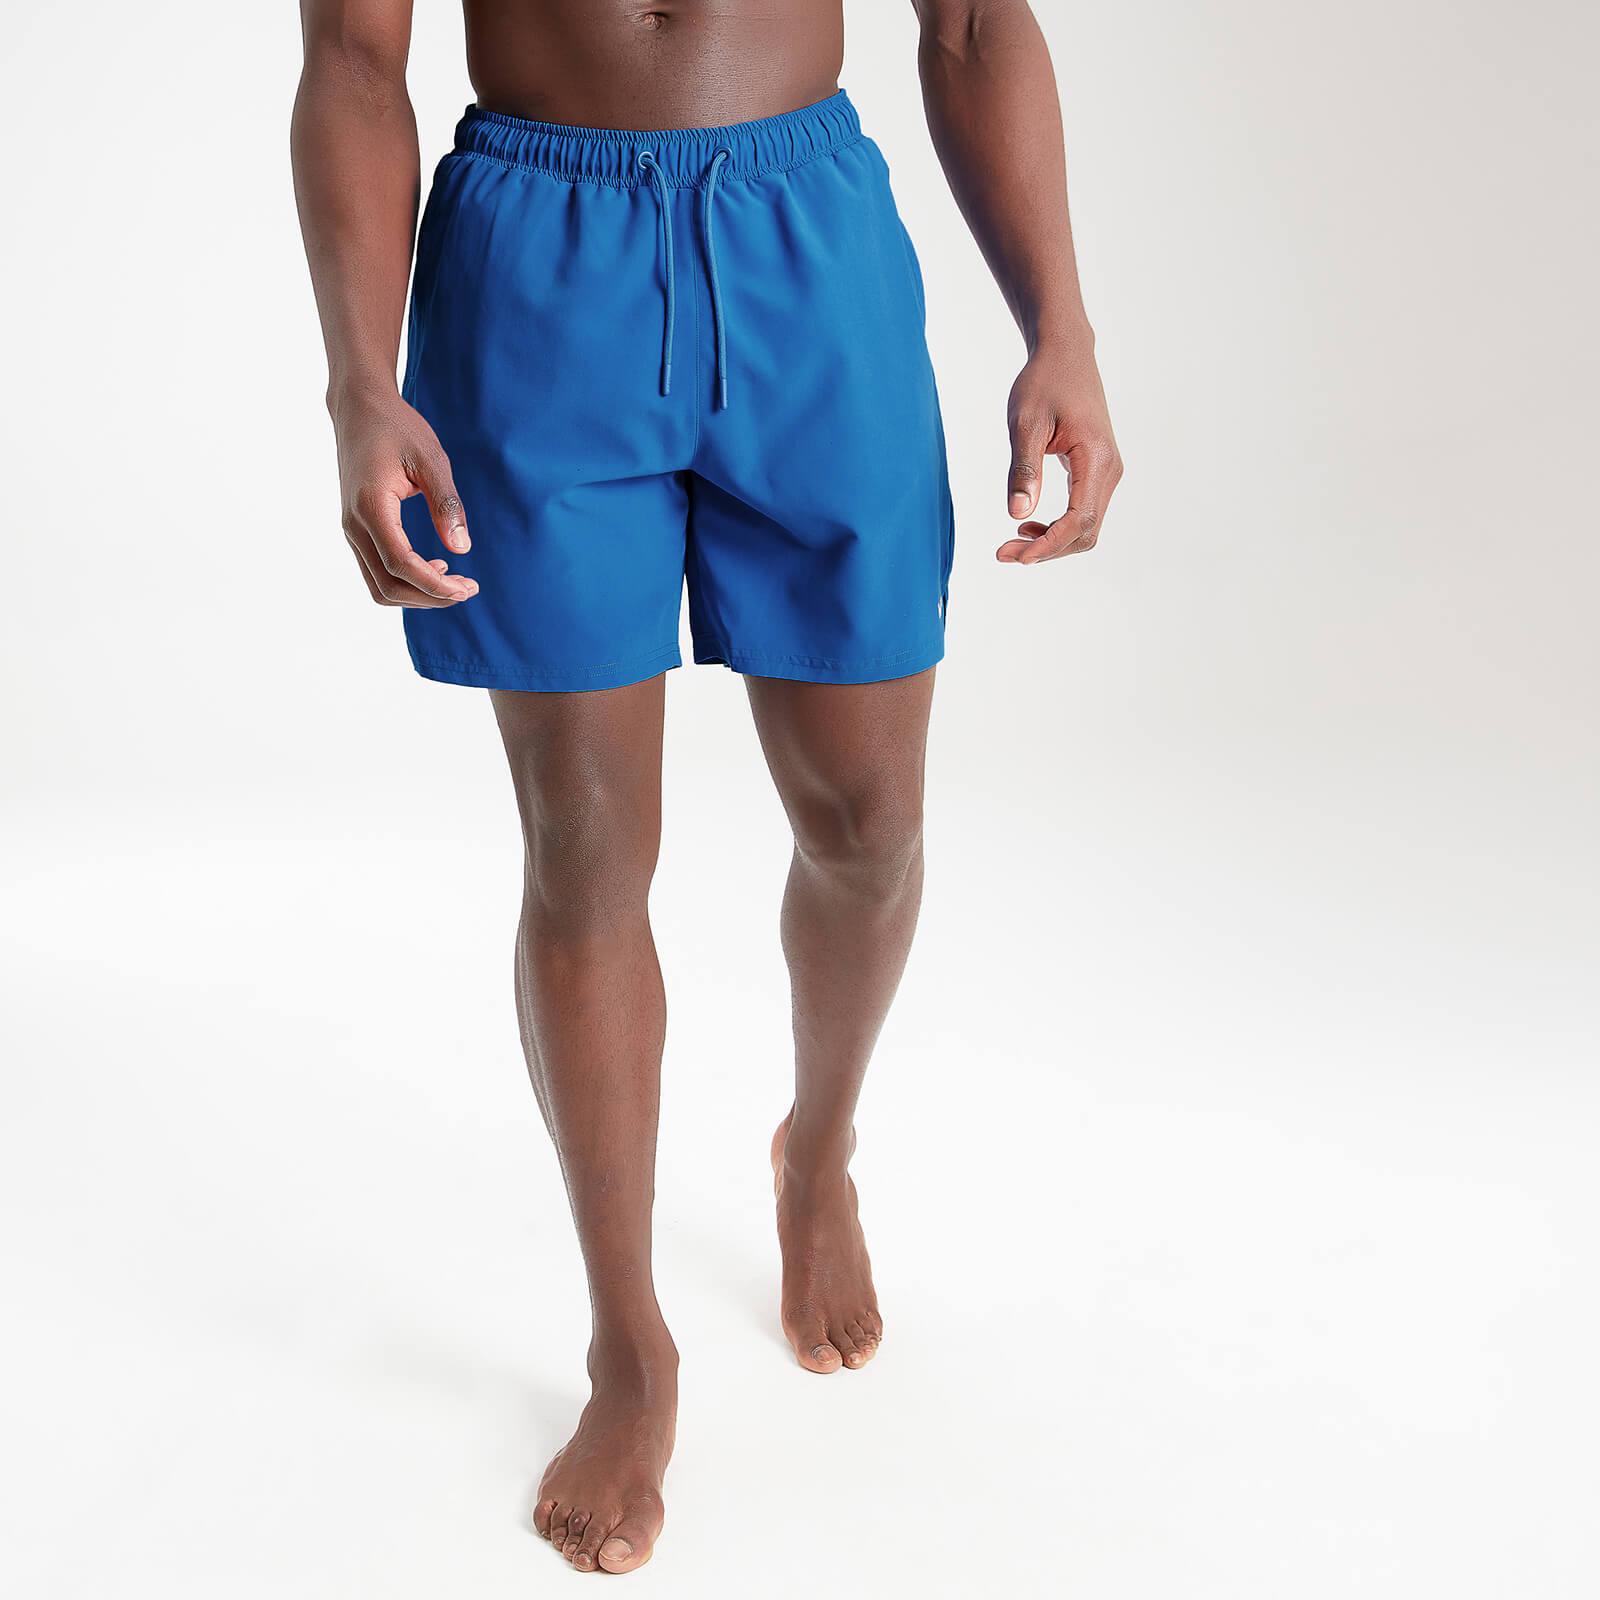 MP Men's Pacific Swim Shorts - True Blue - XXL